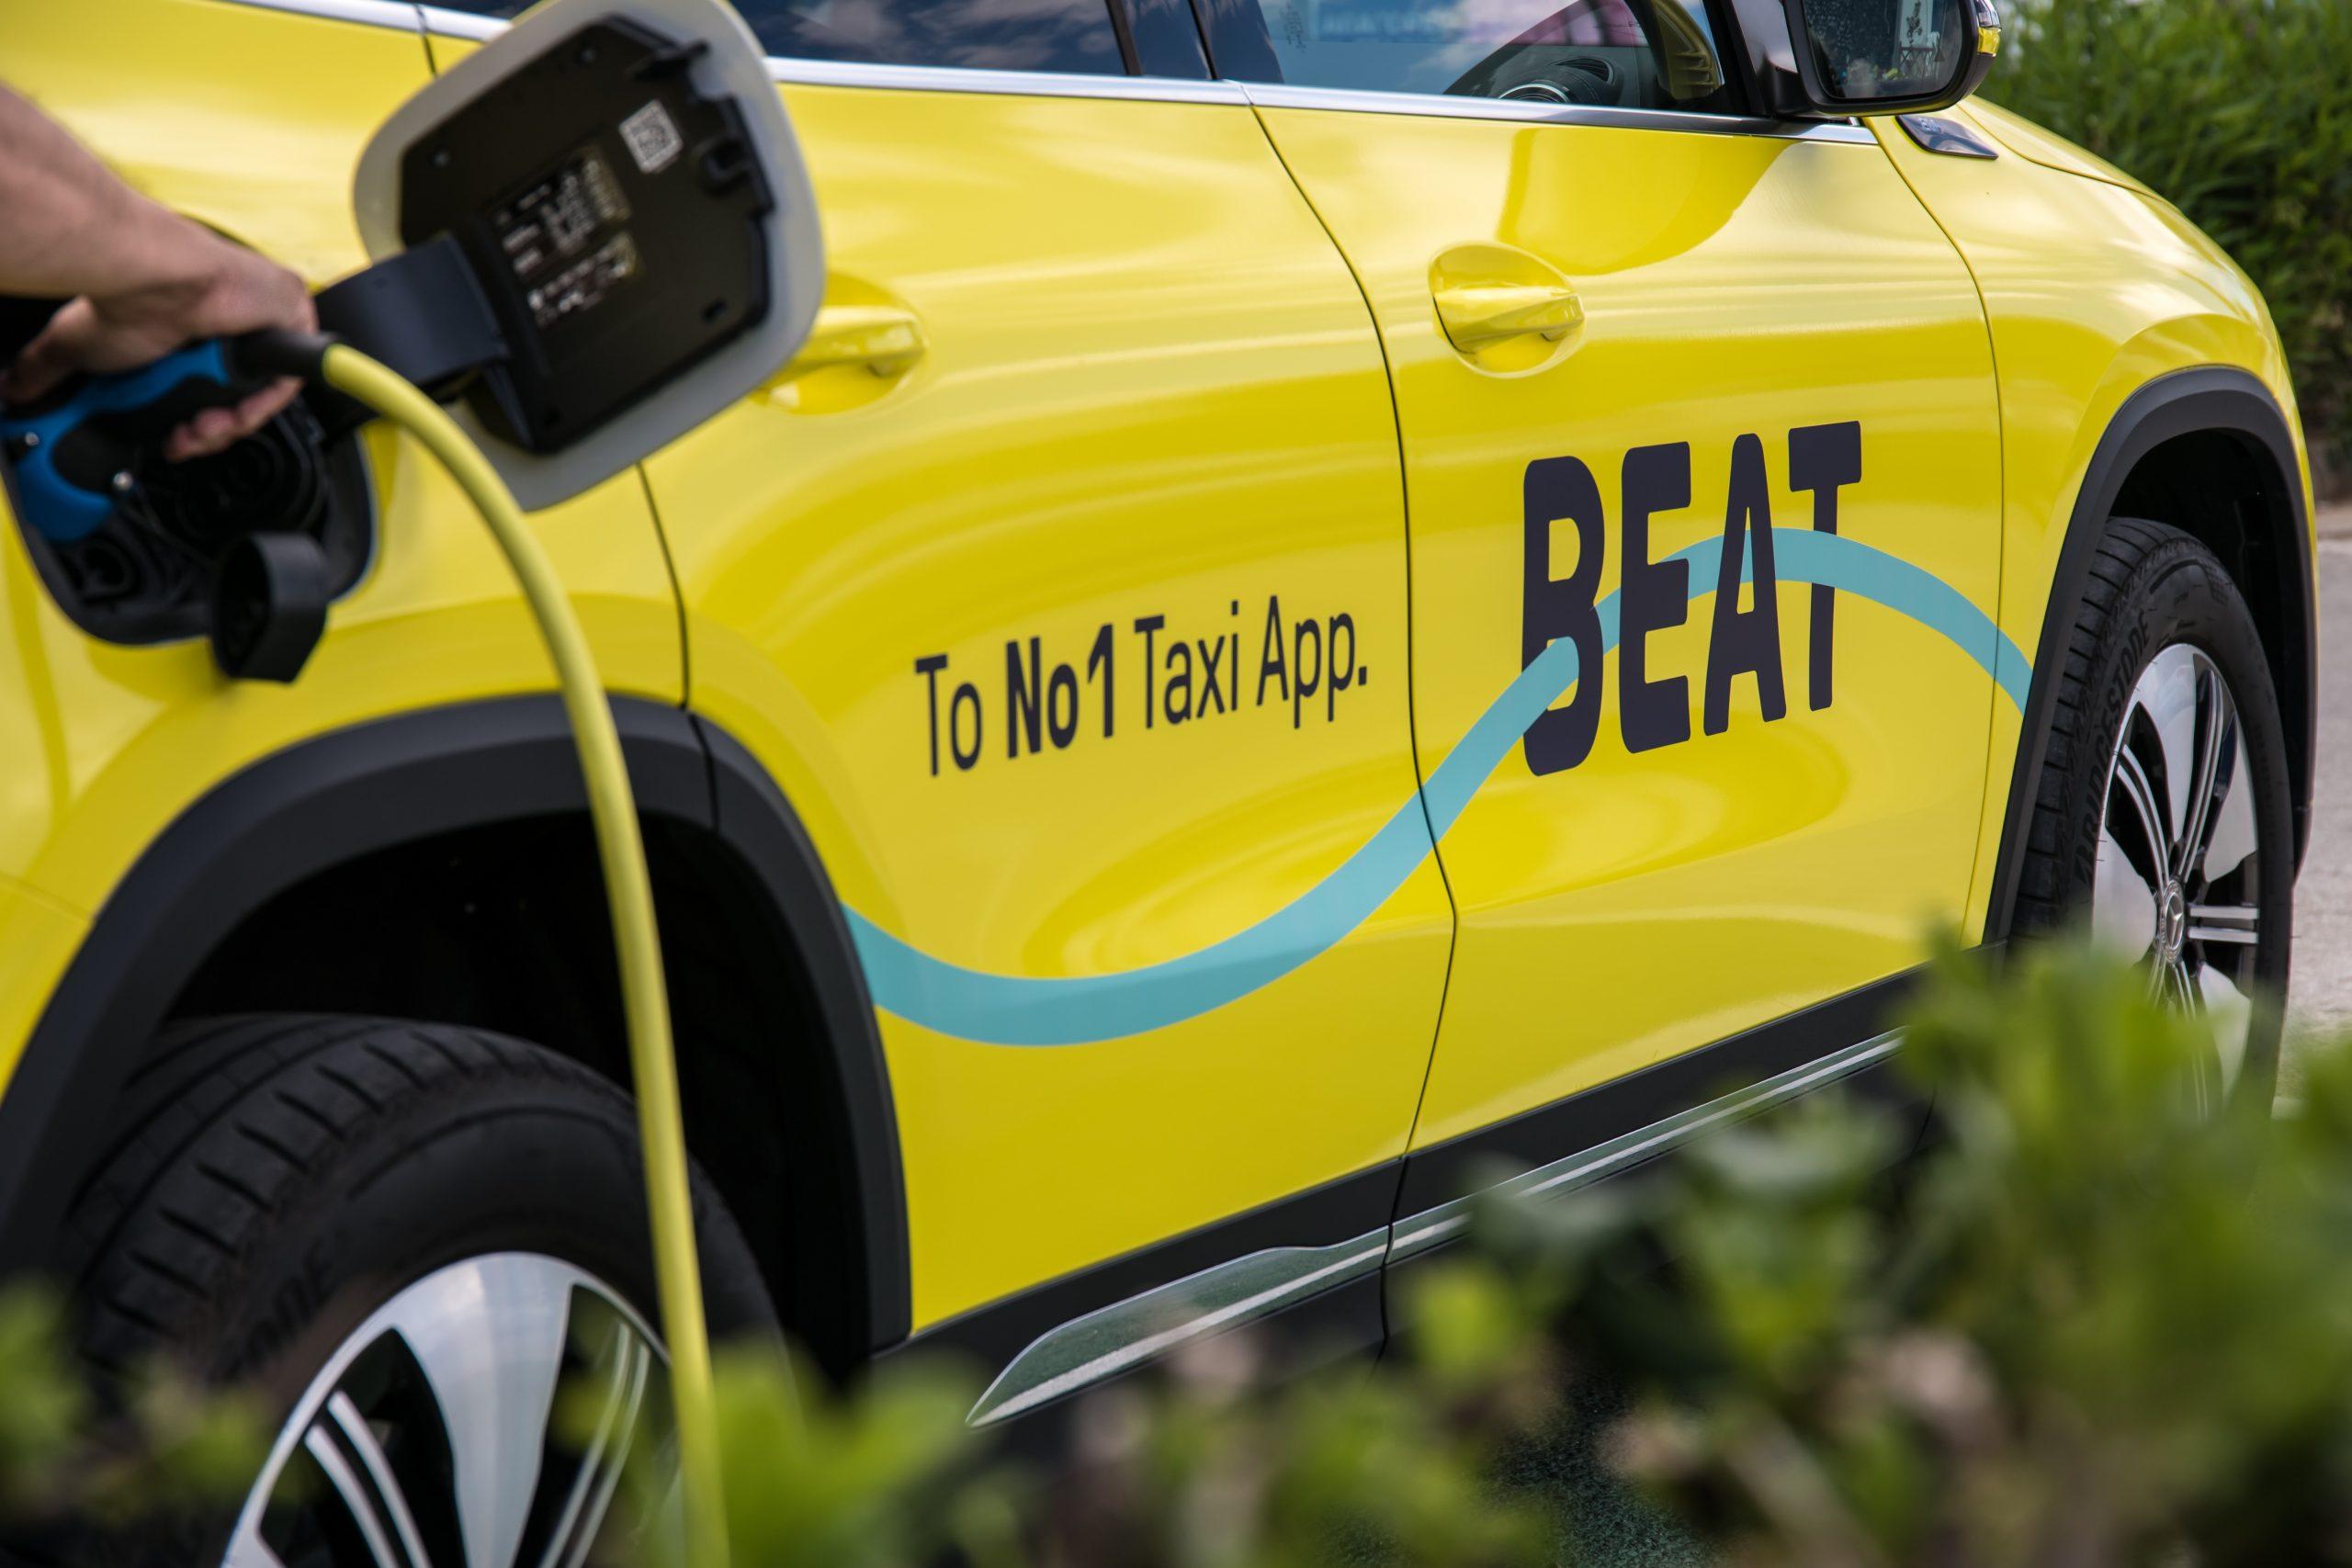 BEAT 0095 scaled ΒΕΑΤ : Μηδενικό αποτύπωμα ρύπων έως το 2025 BEAT, Electric cars, electric vehicles, ειδήσεις, ηλεκτρικά, ηλεκτροκινηση, κινουμαι ηλεκτρικα, Νέα, ταξί